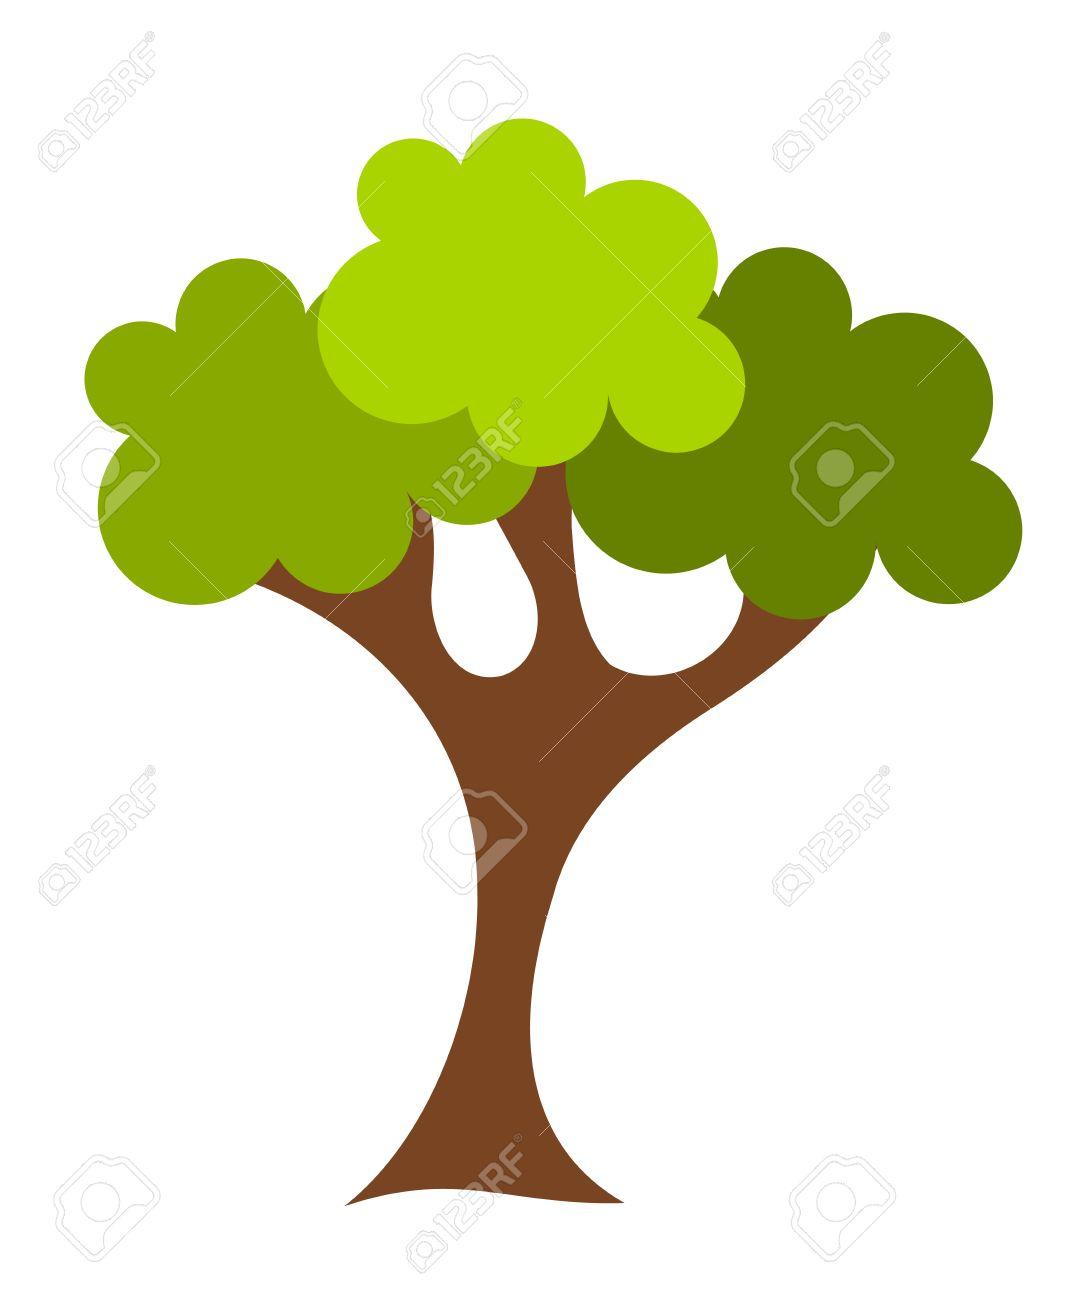 green cartoon oak tree vector illustration royalty free cliparts rh 123rf com oak tree vector free oak tree vector clip art